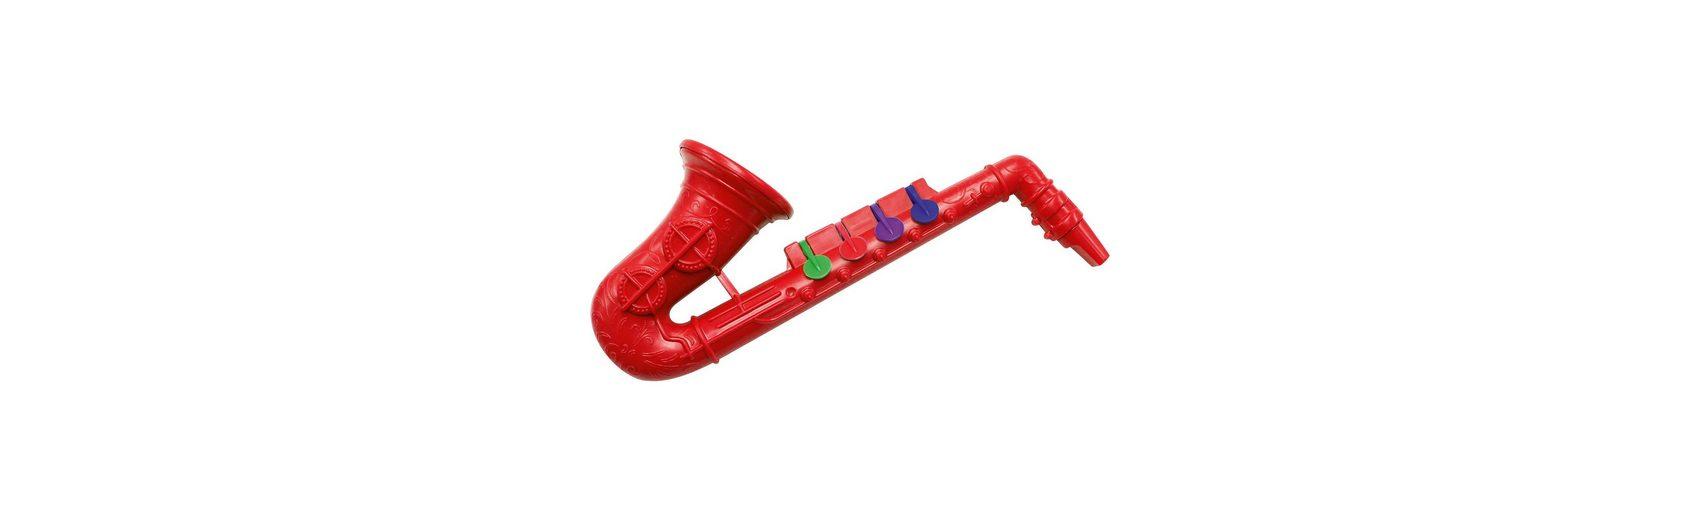 Saxophon Concerto, 23 cm